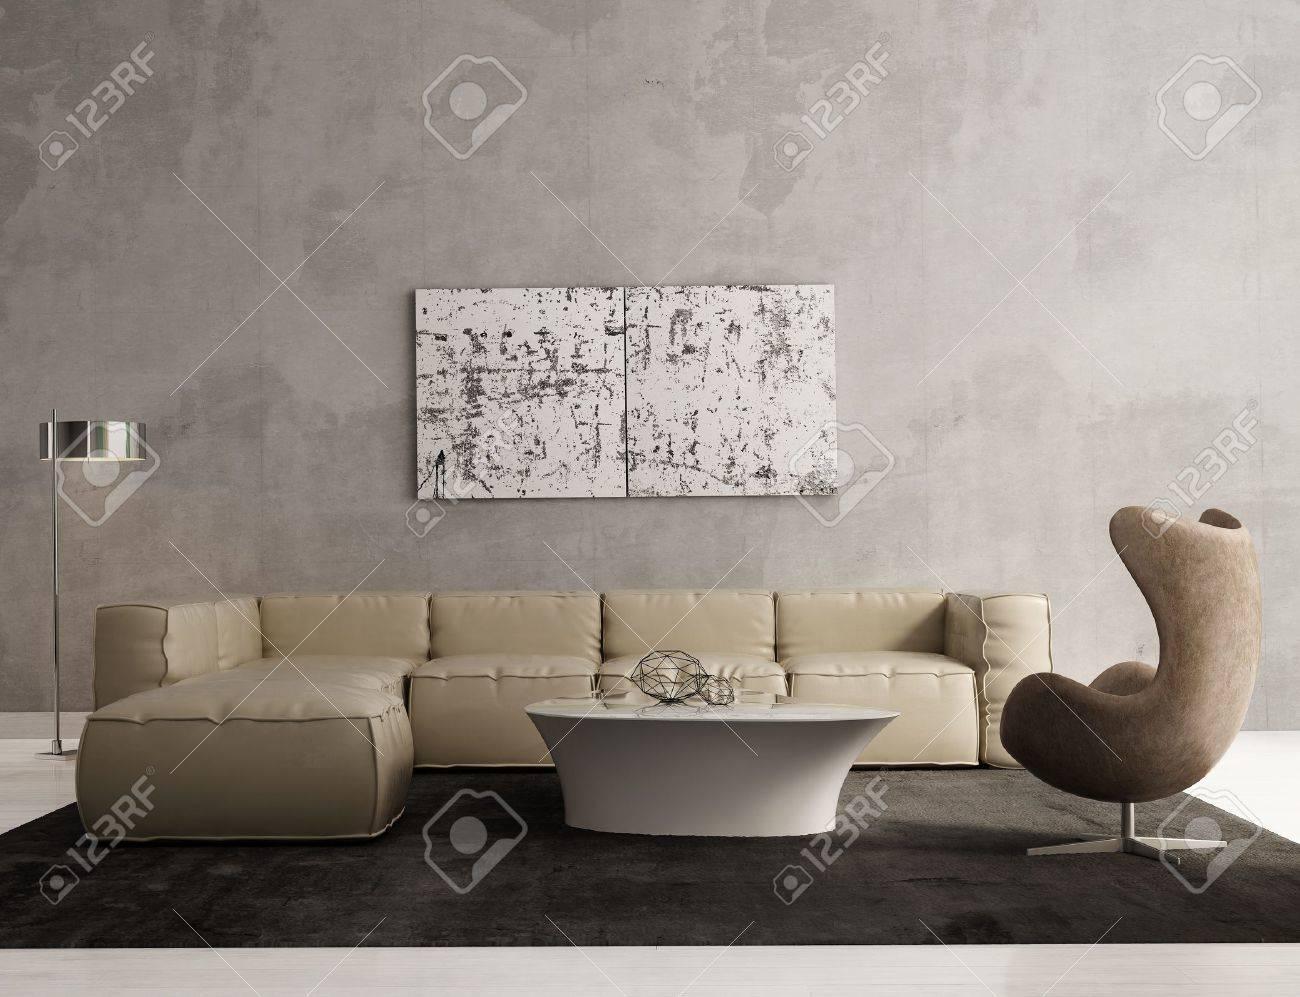 Eigentijdse grijze woonkamer interieur royalty vrije foto ...